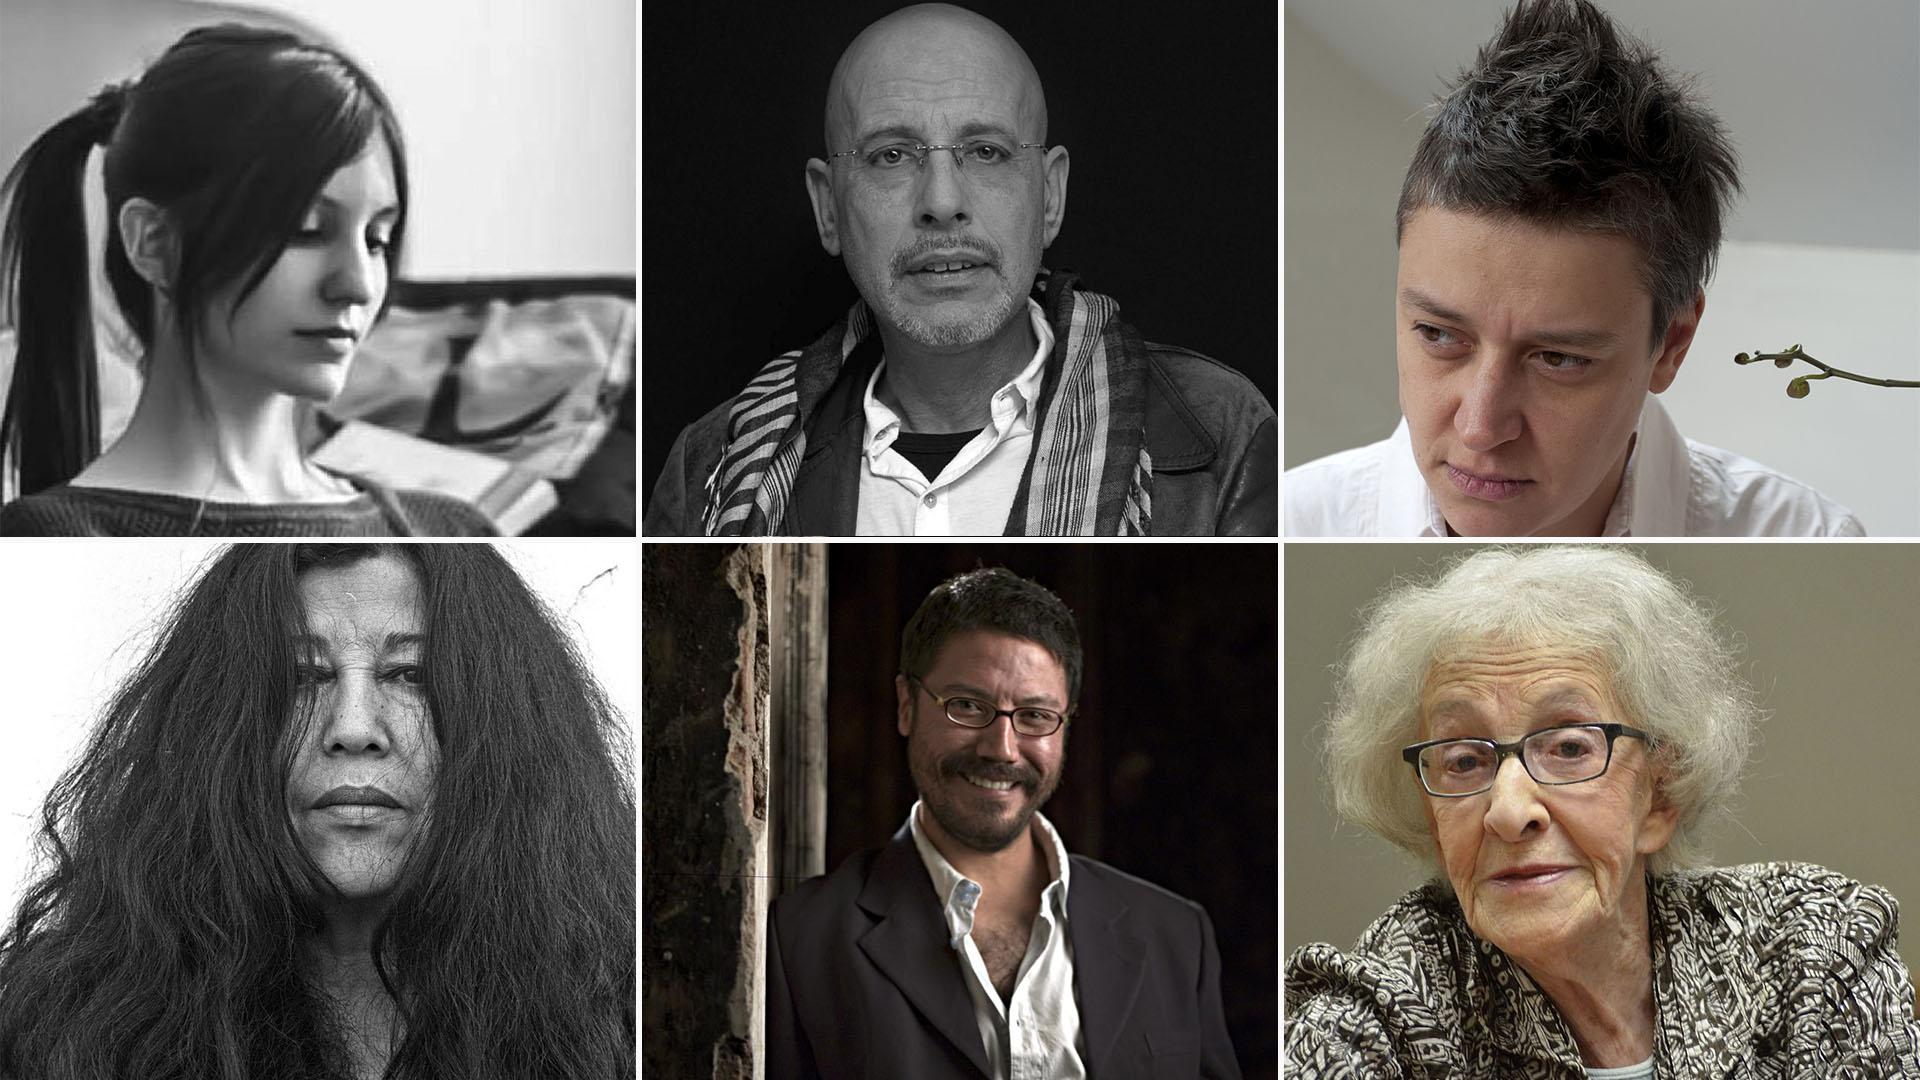 Paula Giglio, Lello Voce, Anja Golob, Carmen Berenguer, Edwin Madrid e Ida Vitale, algunas de las visitas destacadas del Festival